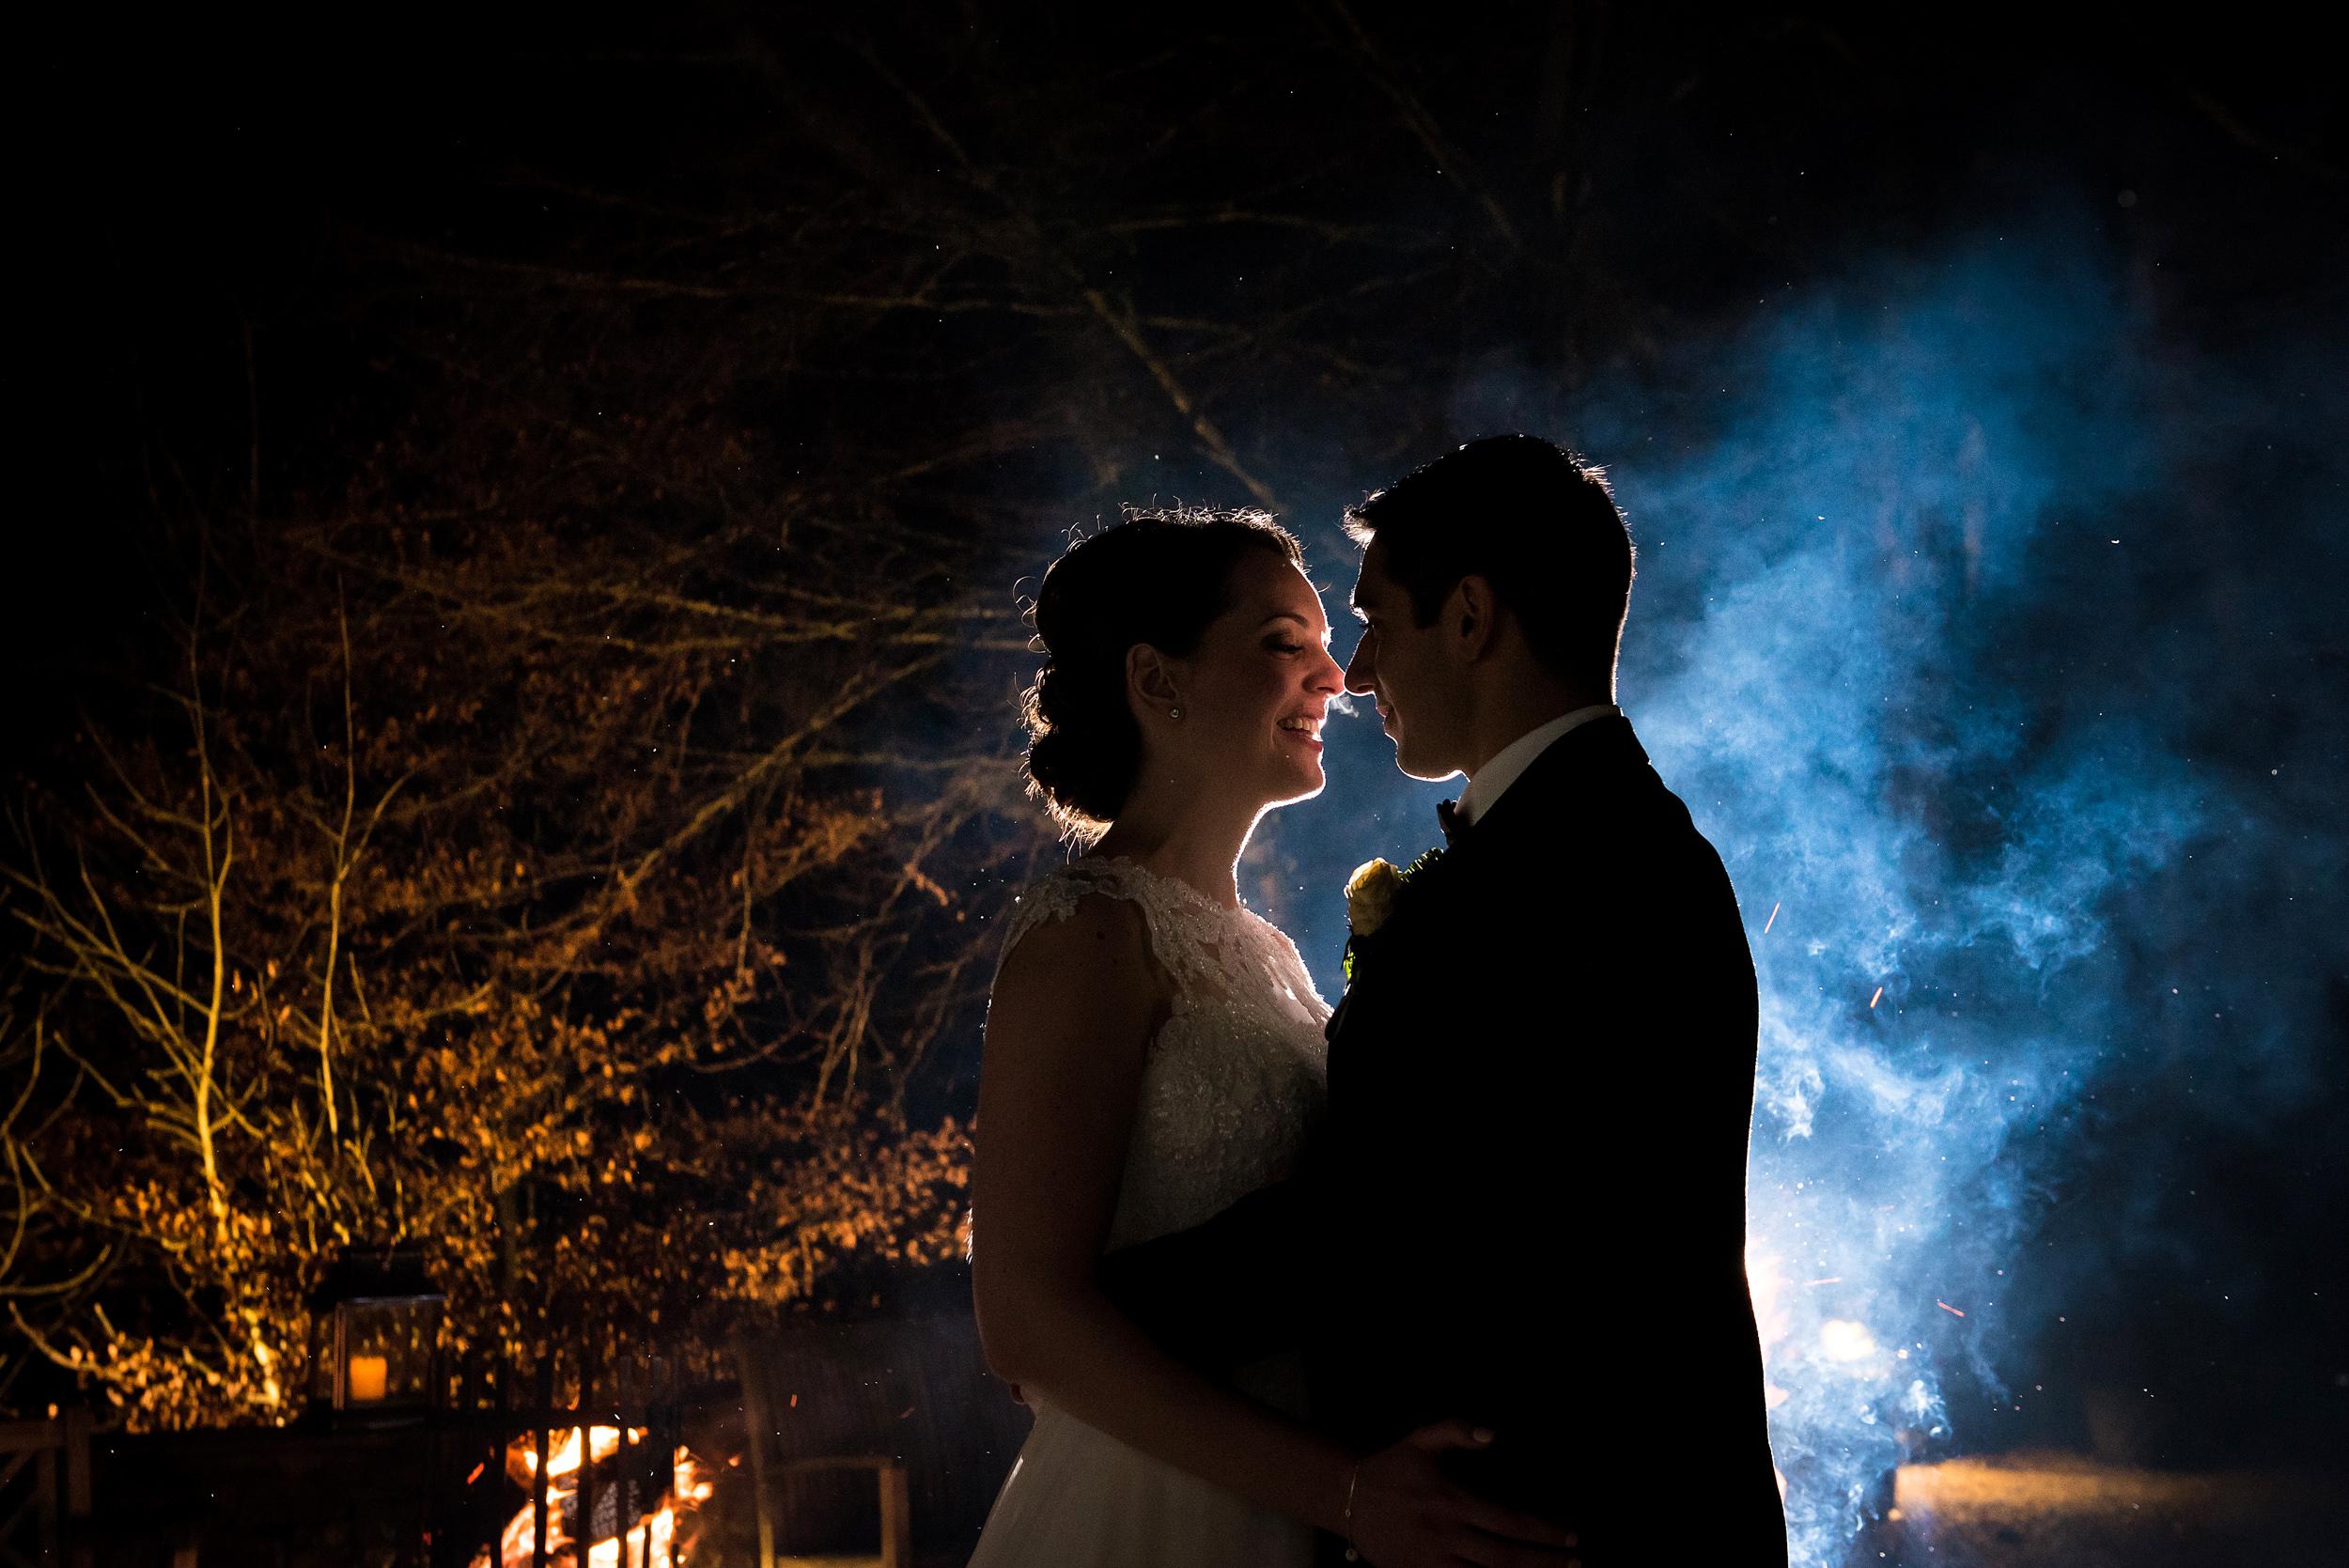 David Scholes Lancashire wedding photography 2016-32.jpg